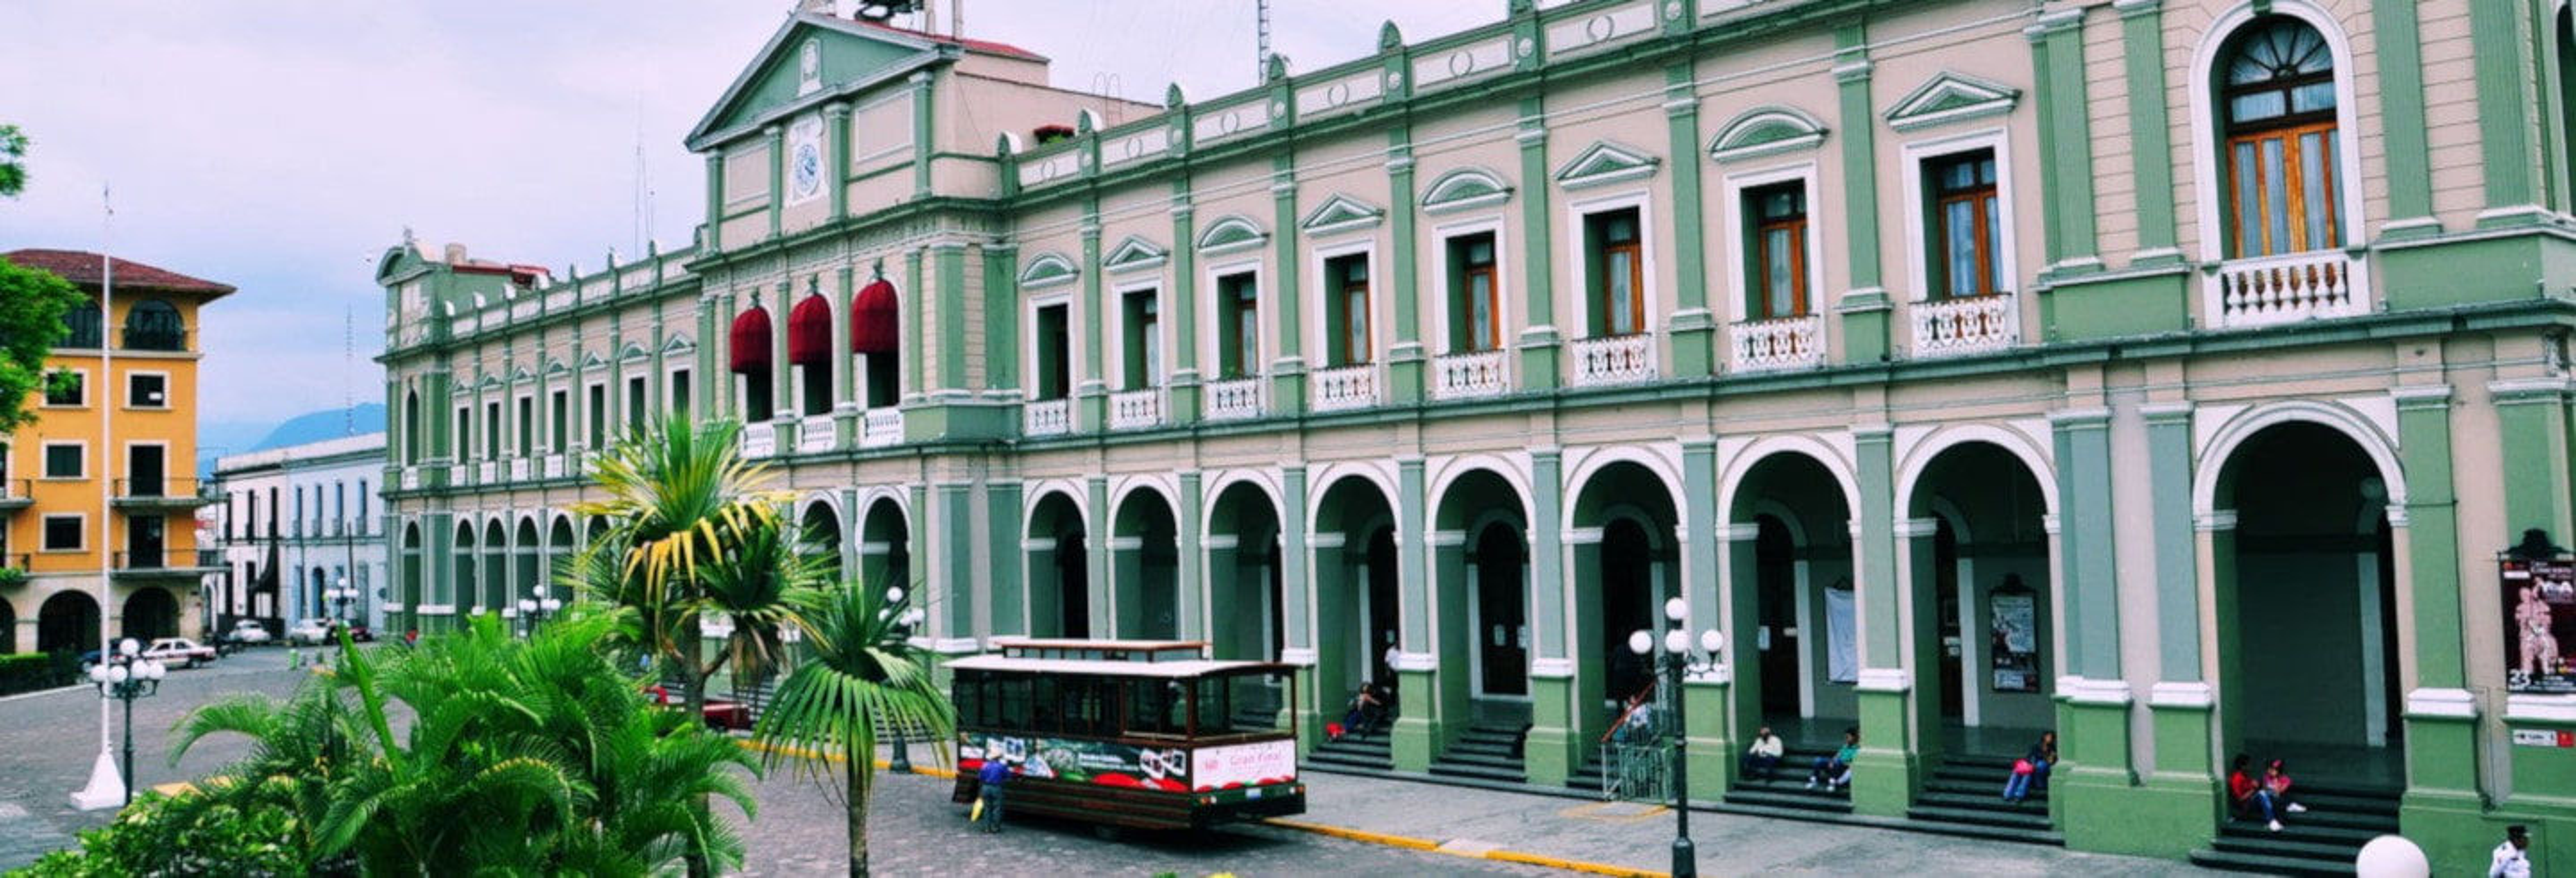 Excursión a Córdoba y Orizaba